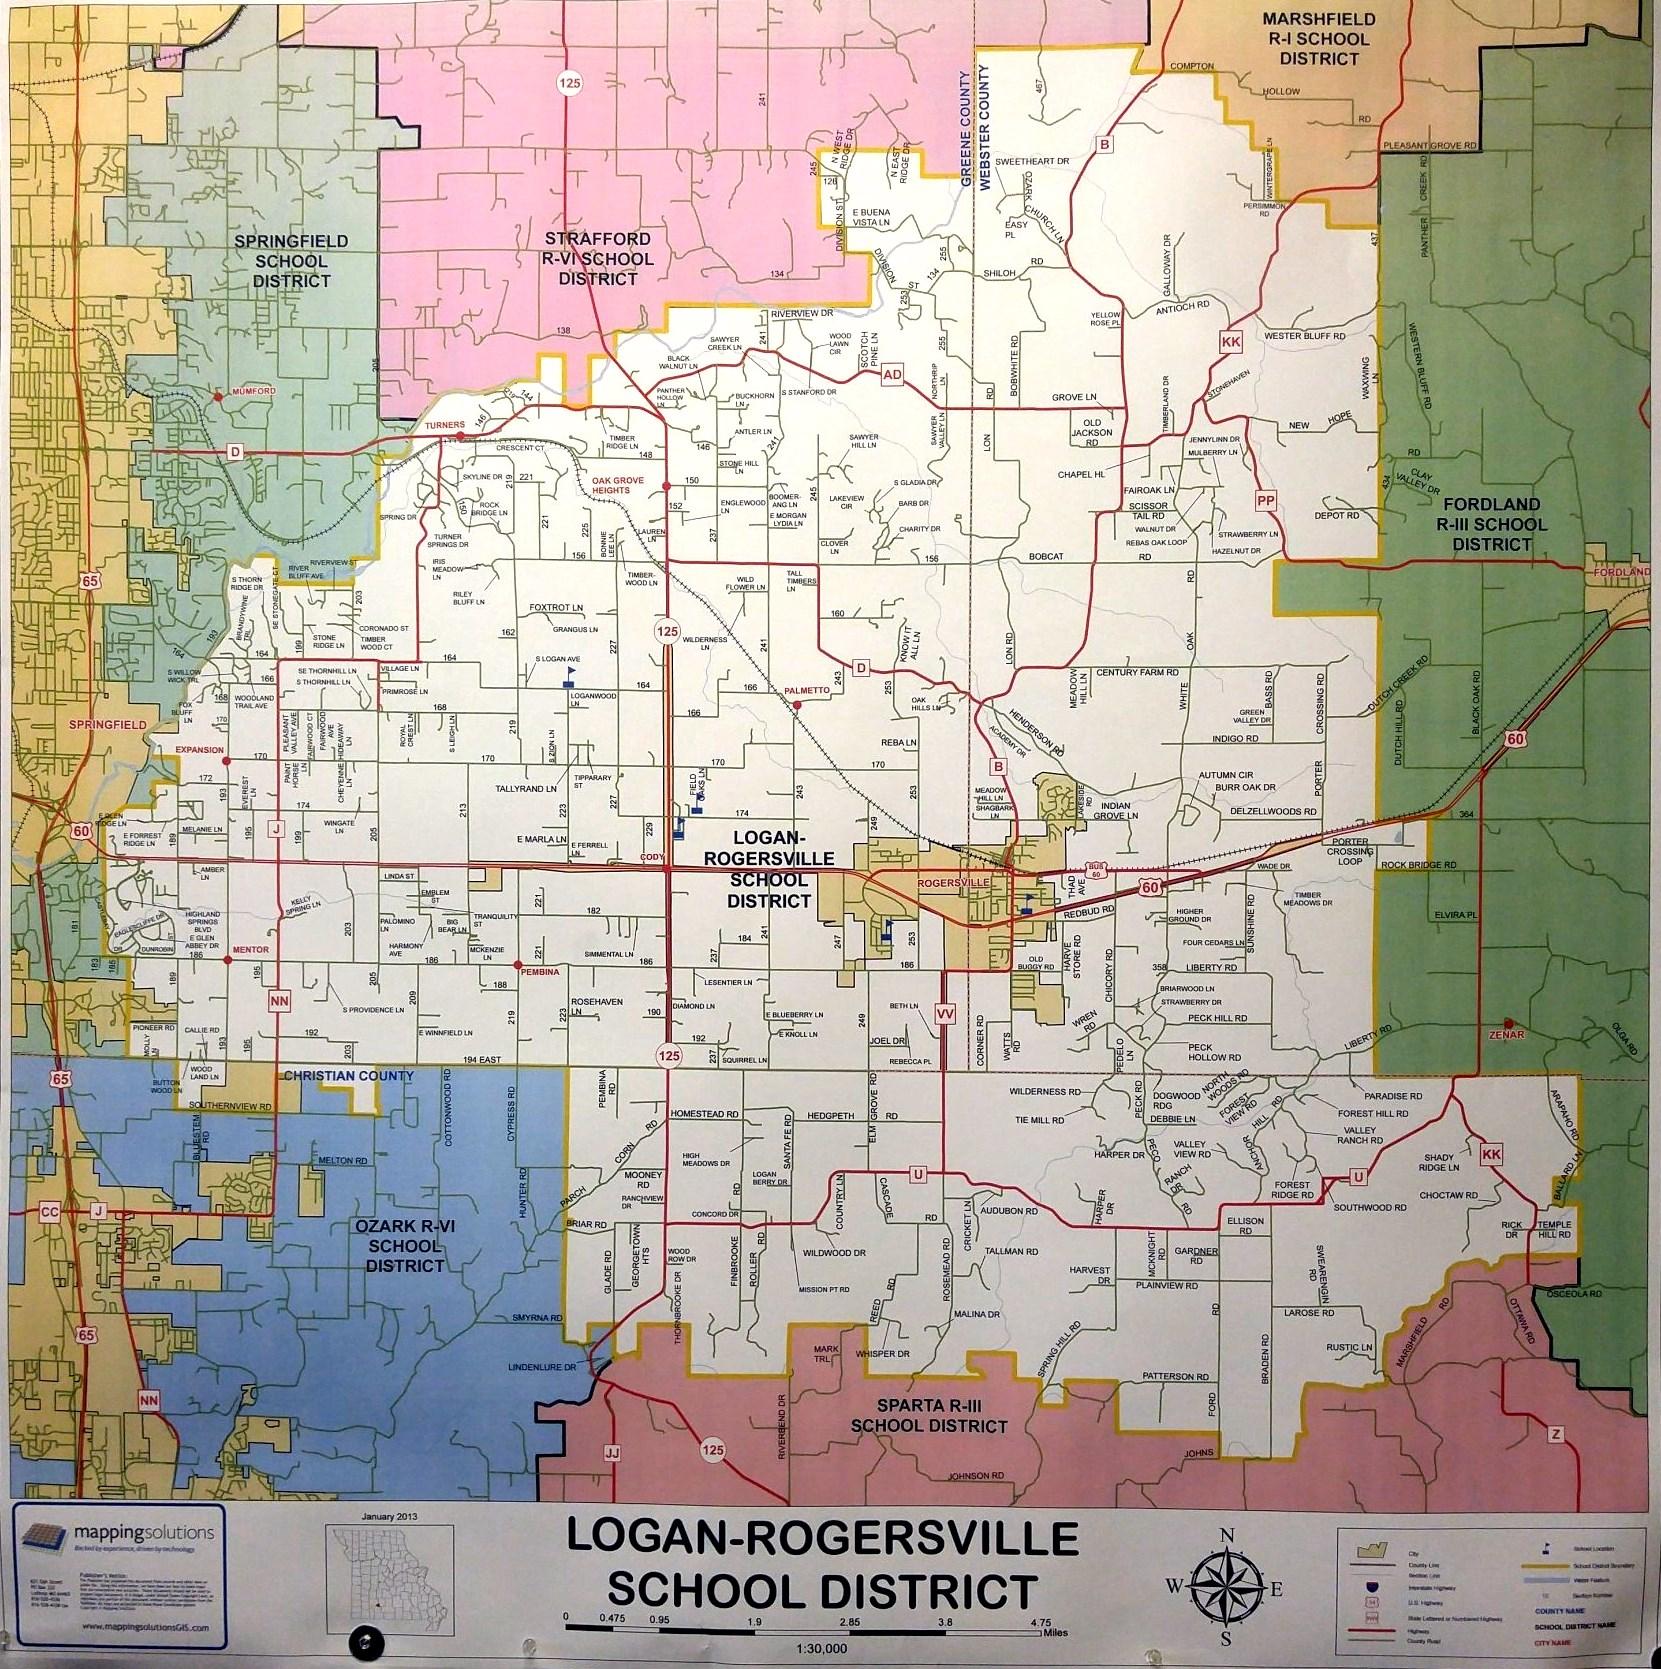 Wildcat And Atlas Schematics Electrical Wiring Diagrams 1996 Yfb250 Timberwolf Diagram Logan Rogersville R Viii District Map